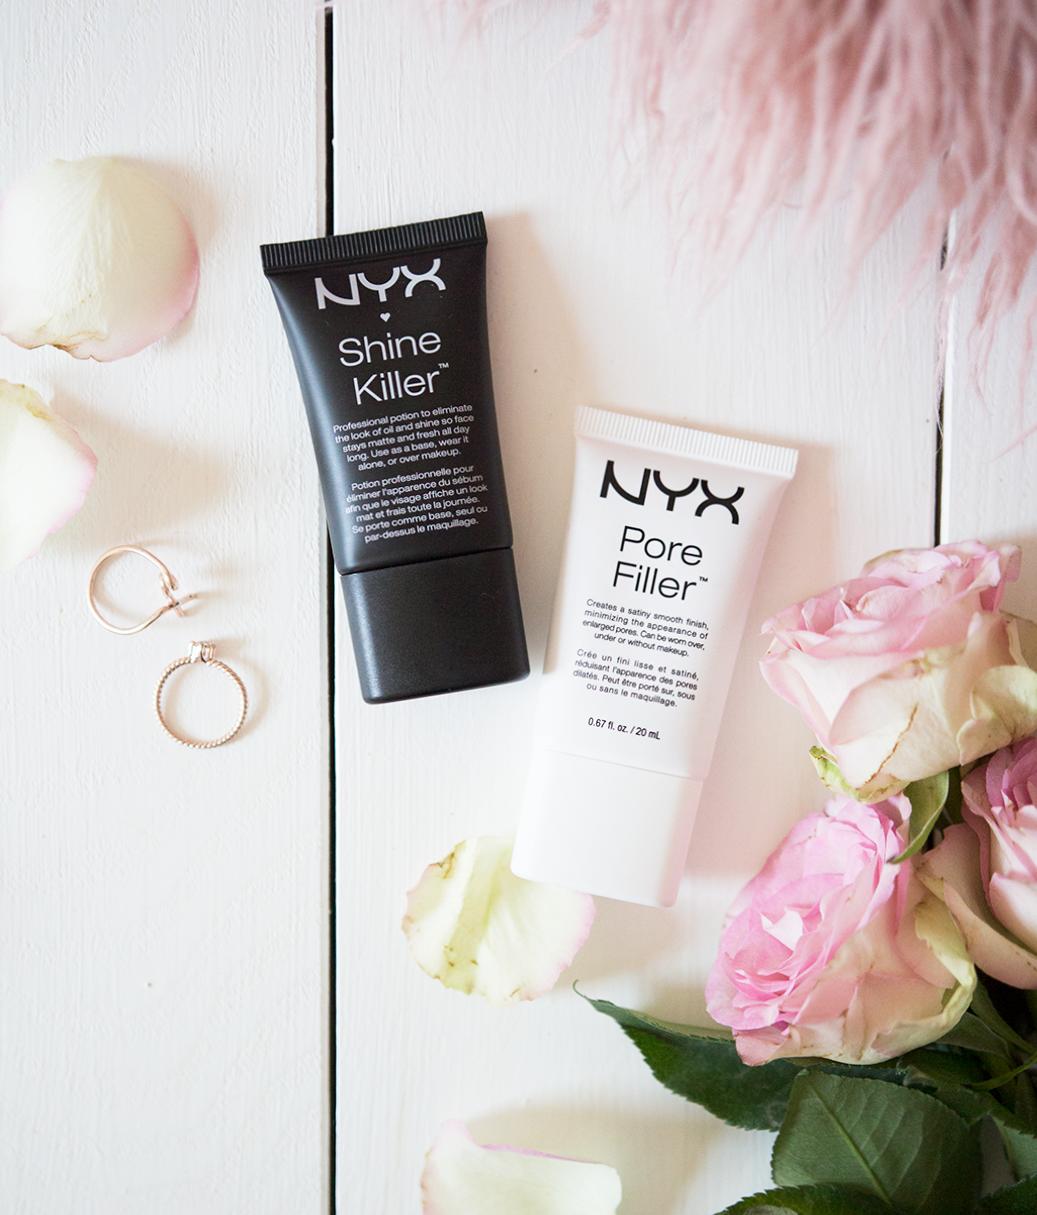 nyx pore filler and shine killer review